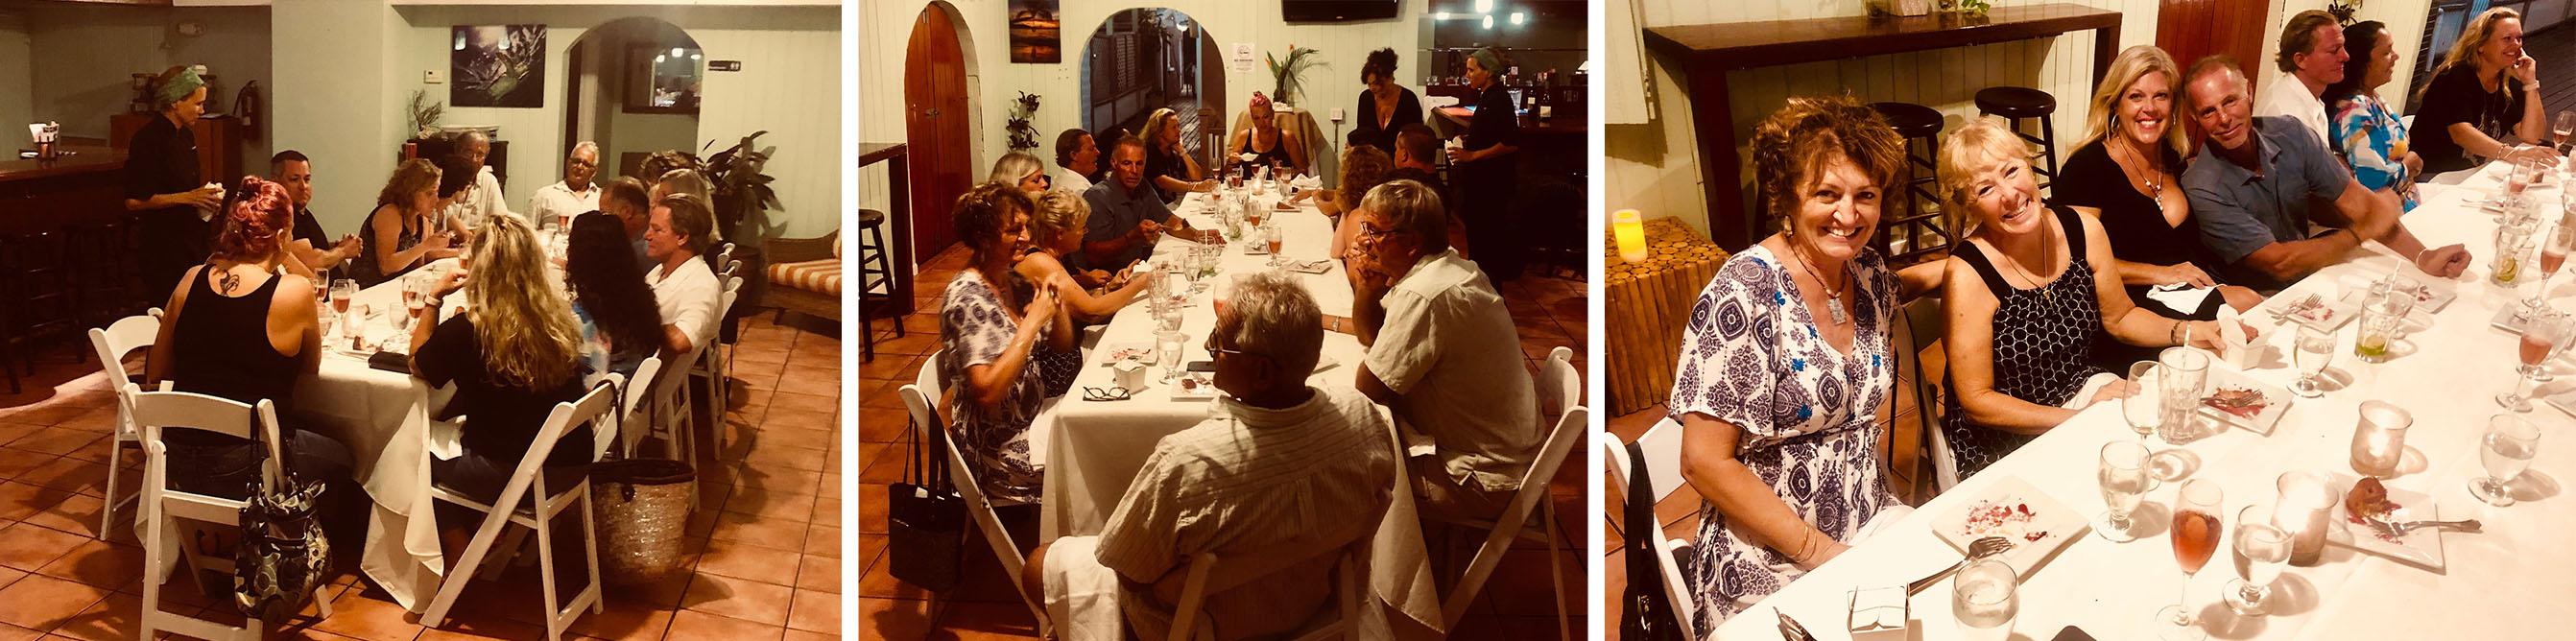 diner guests